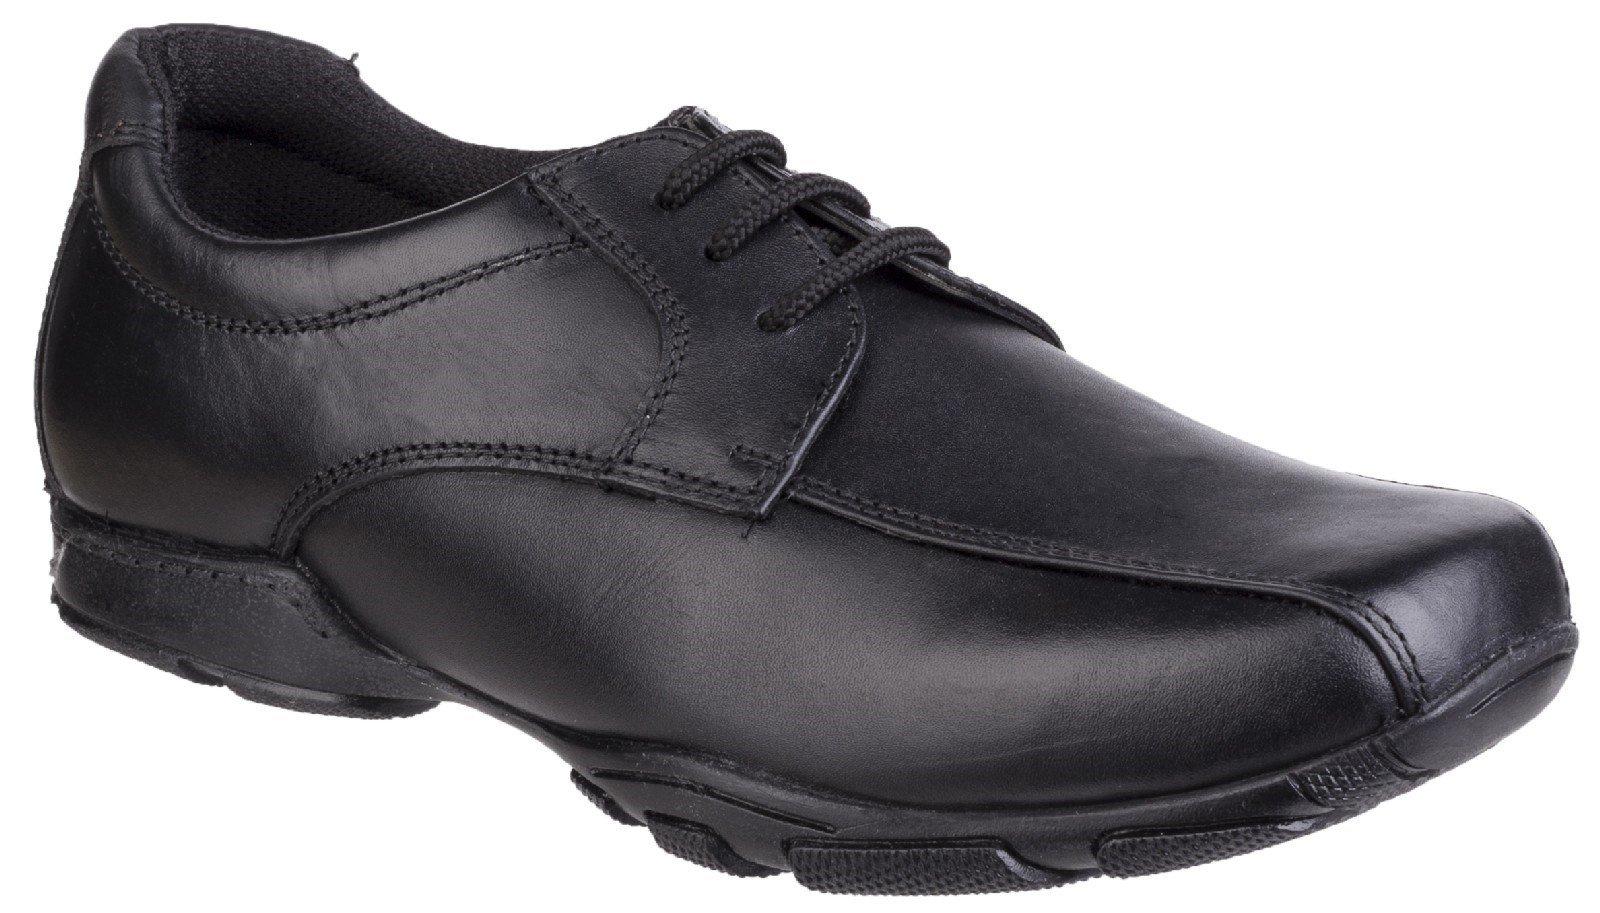 Hush Puppies Men's Vincente Senior School Shoe Black 25352 - Black 7.5